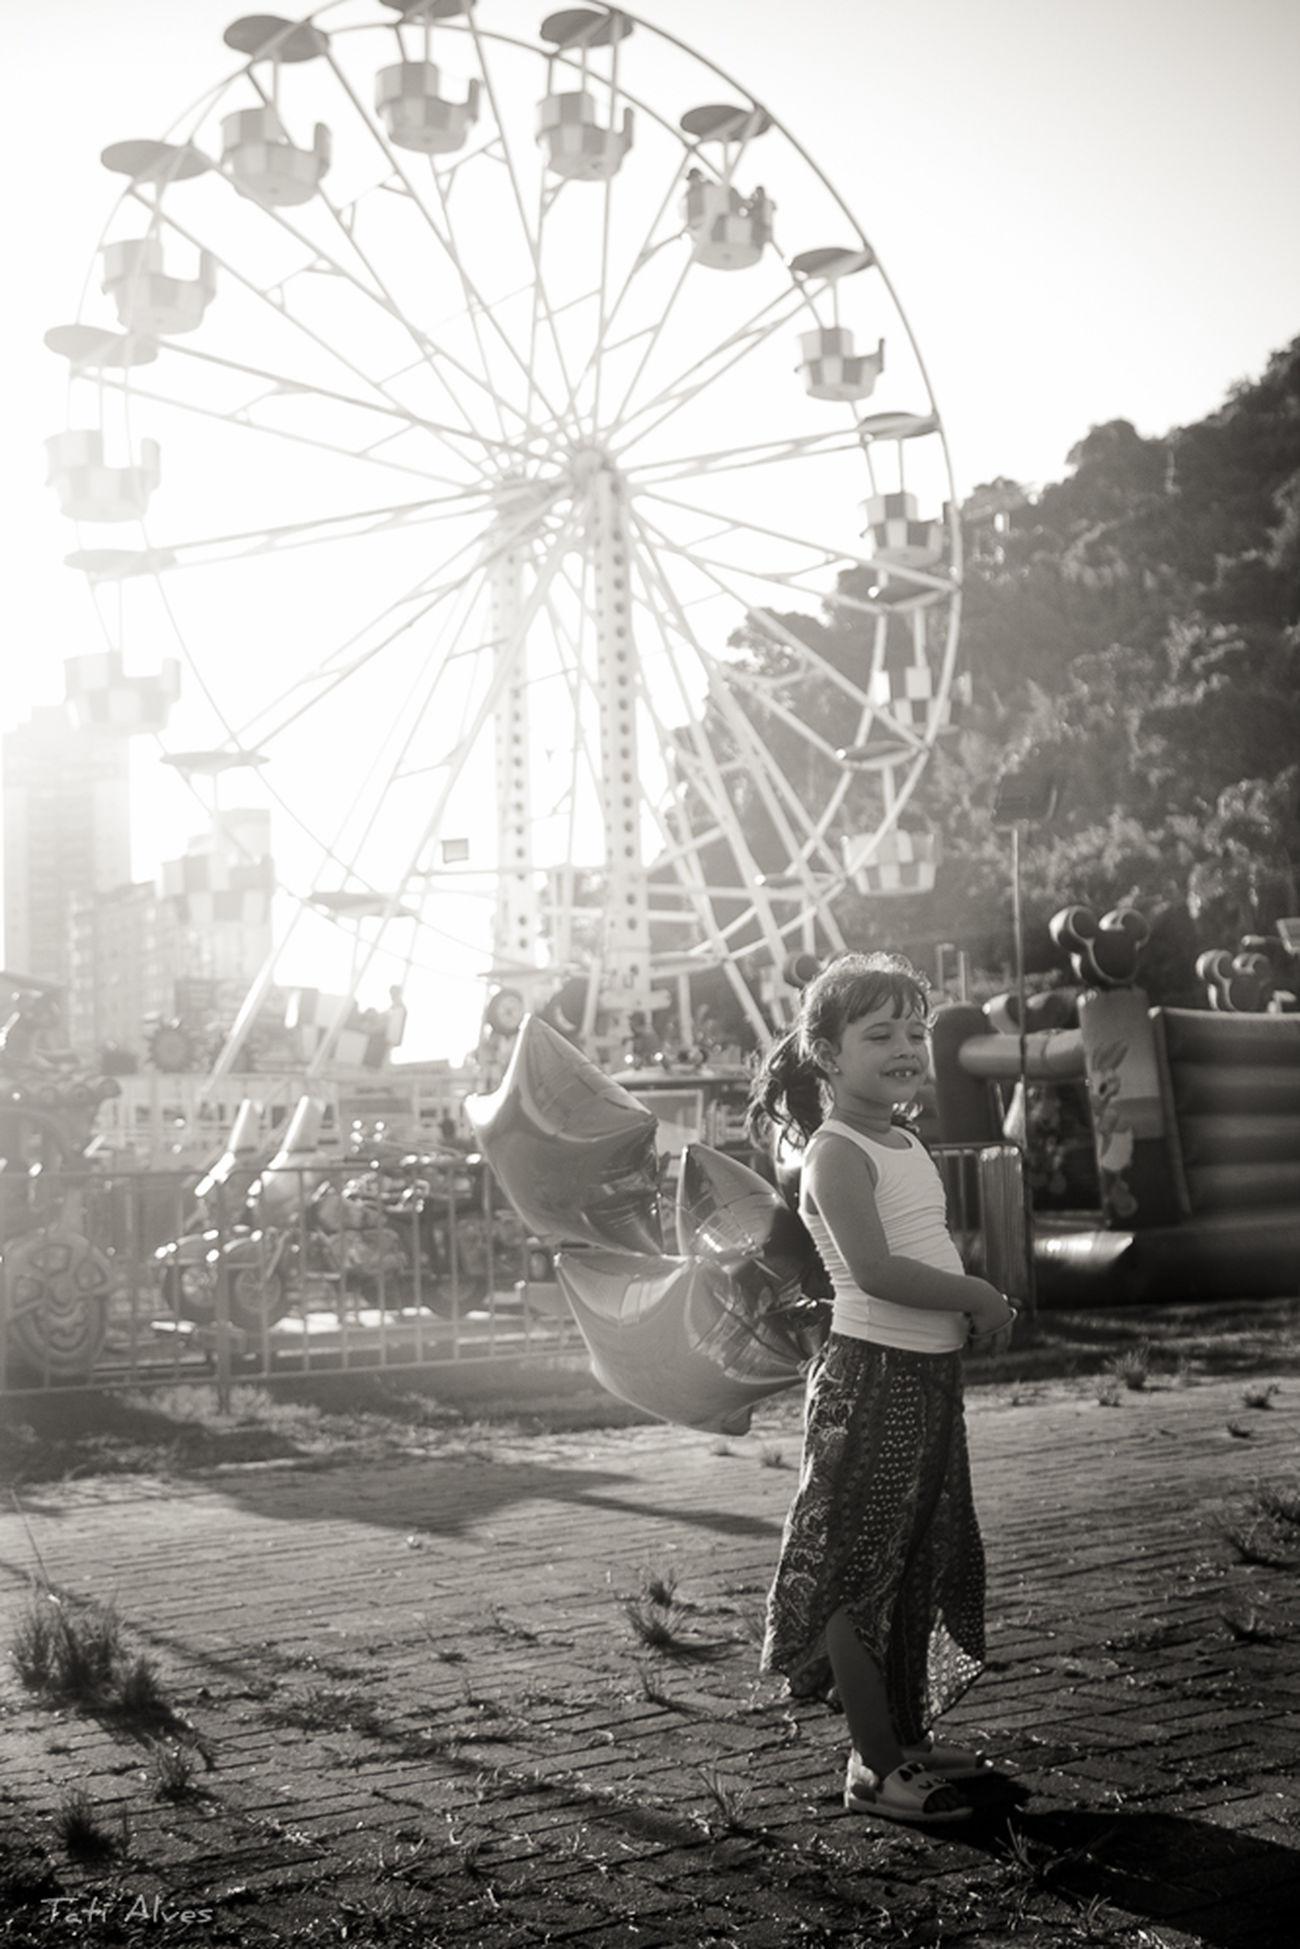 Luiza #bw #childrenphoto #girl #blackandwhite #amp_love #rodagigante